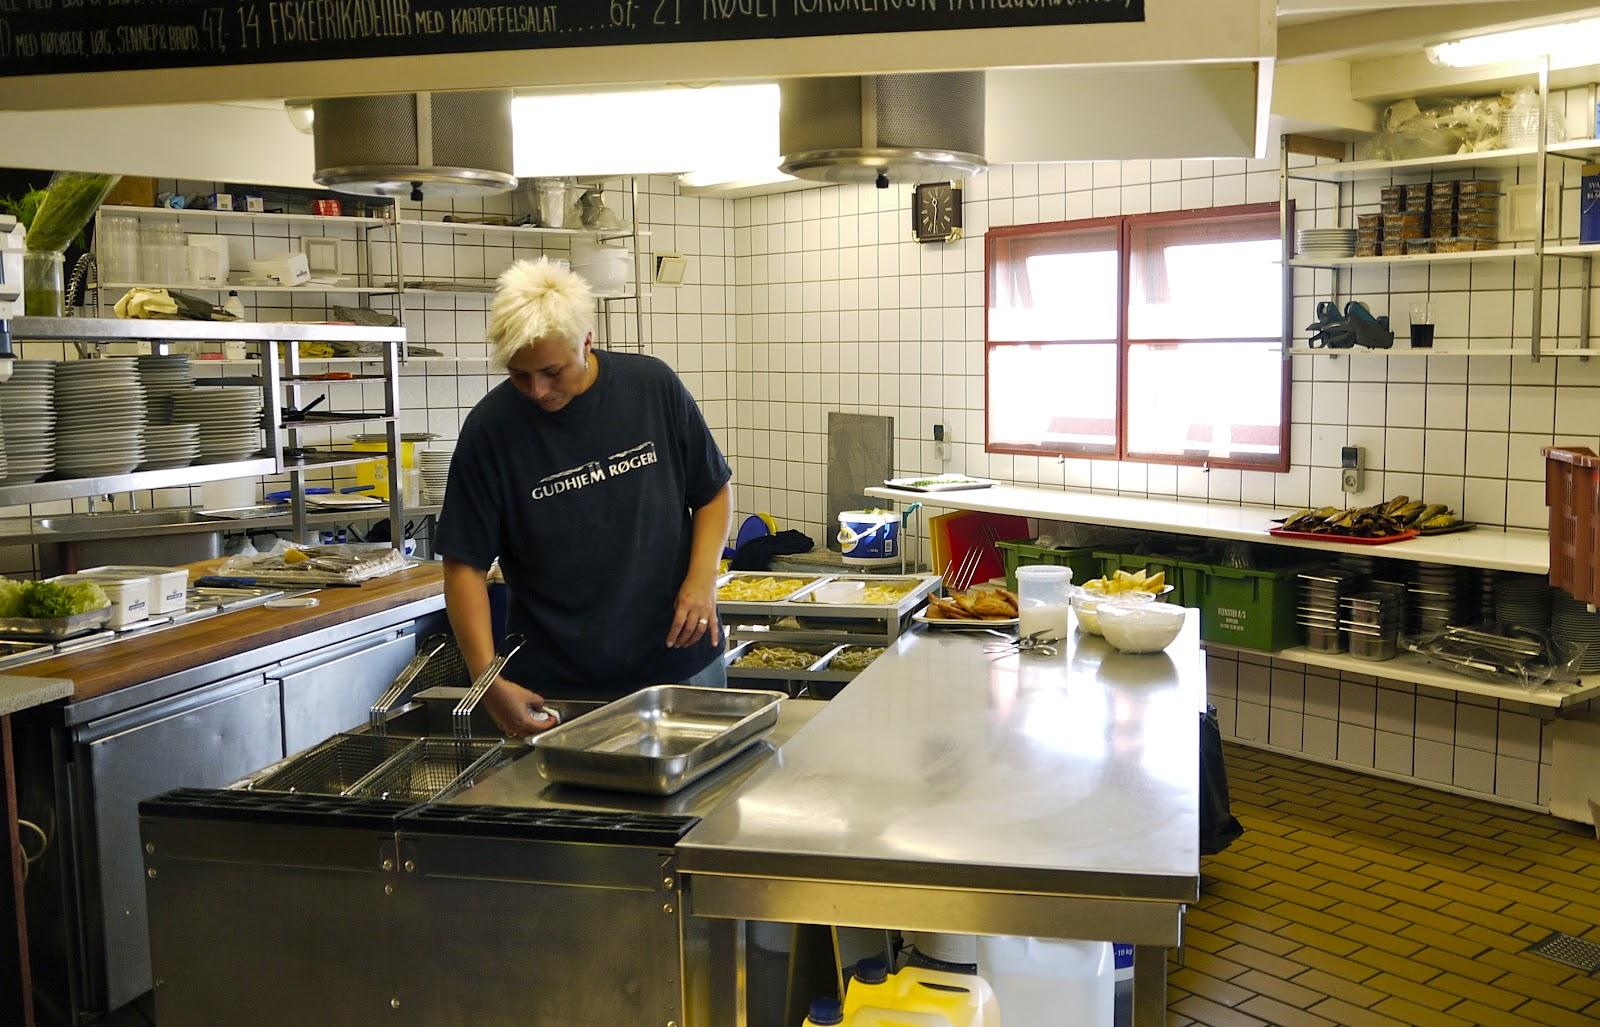 Smitten By Food Gudhjem Rogeri At Bornholm Denmark Smoked Herring